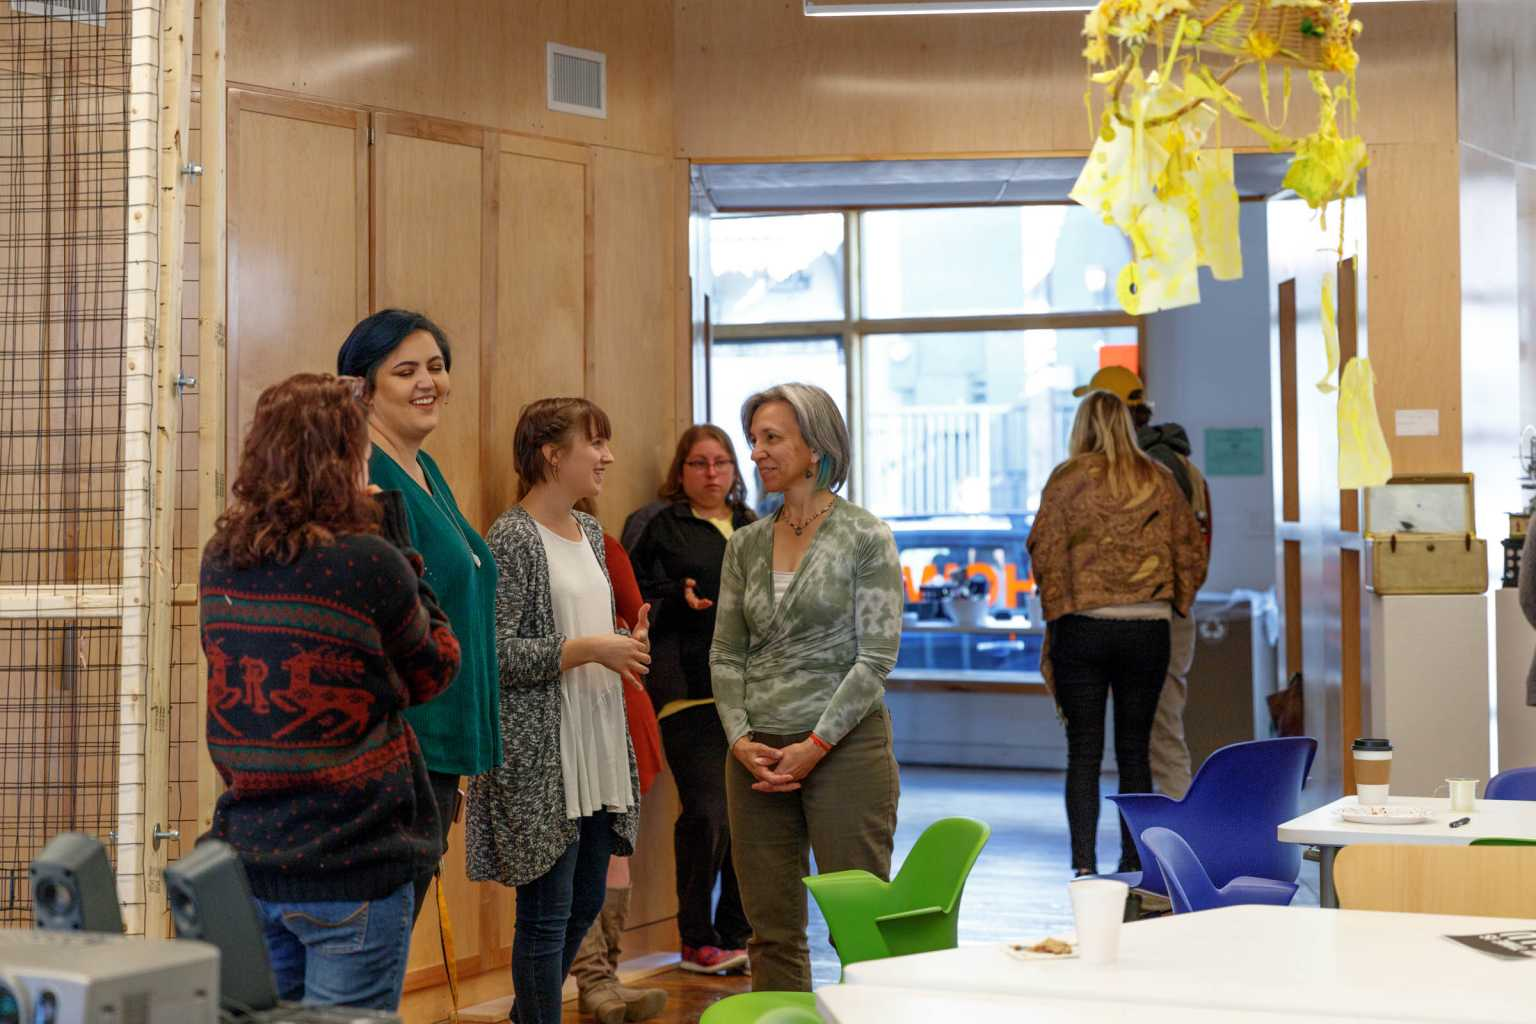 Engaging conversations with Katrina Plato at the Intro Art Education Showcase.